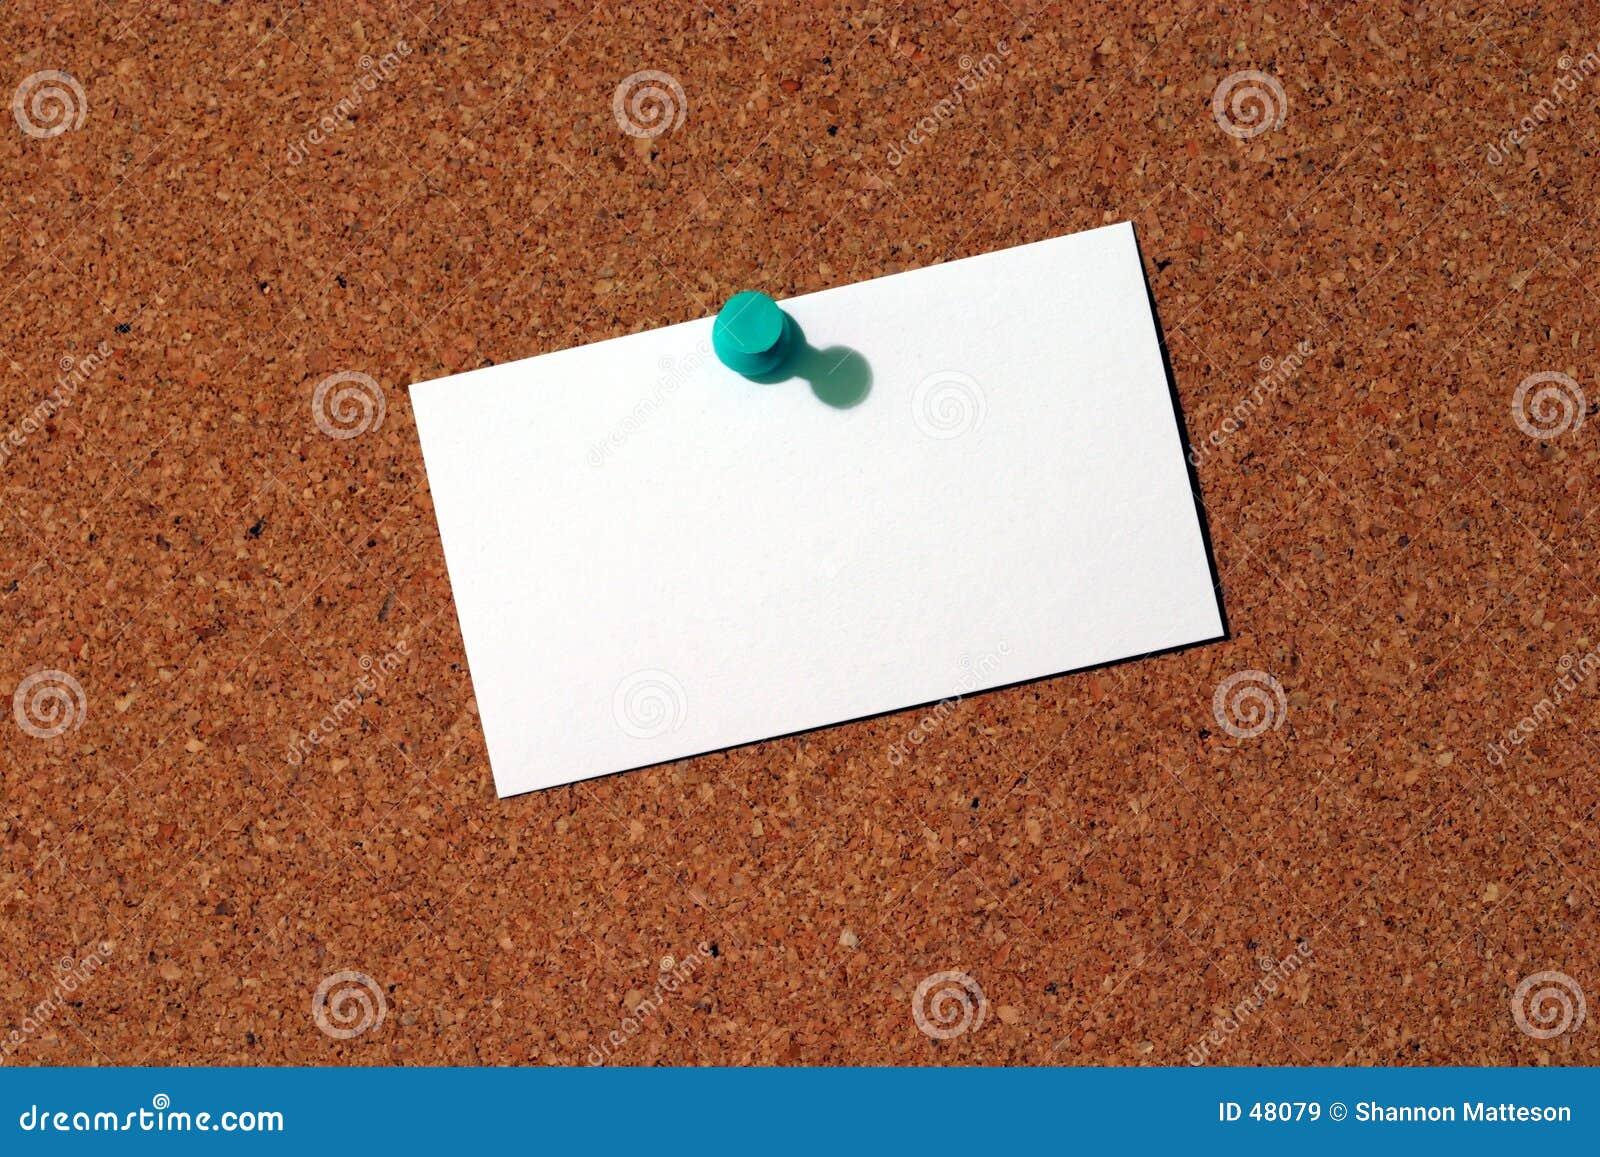 Business Card on Corkboard